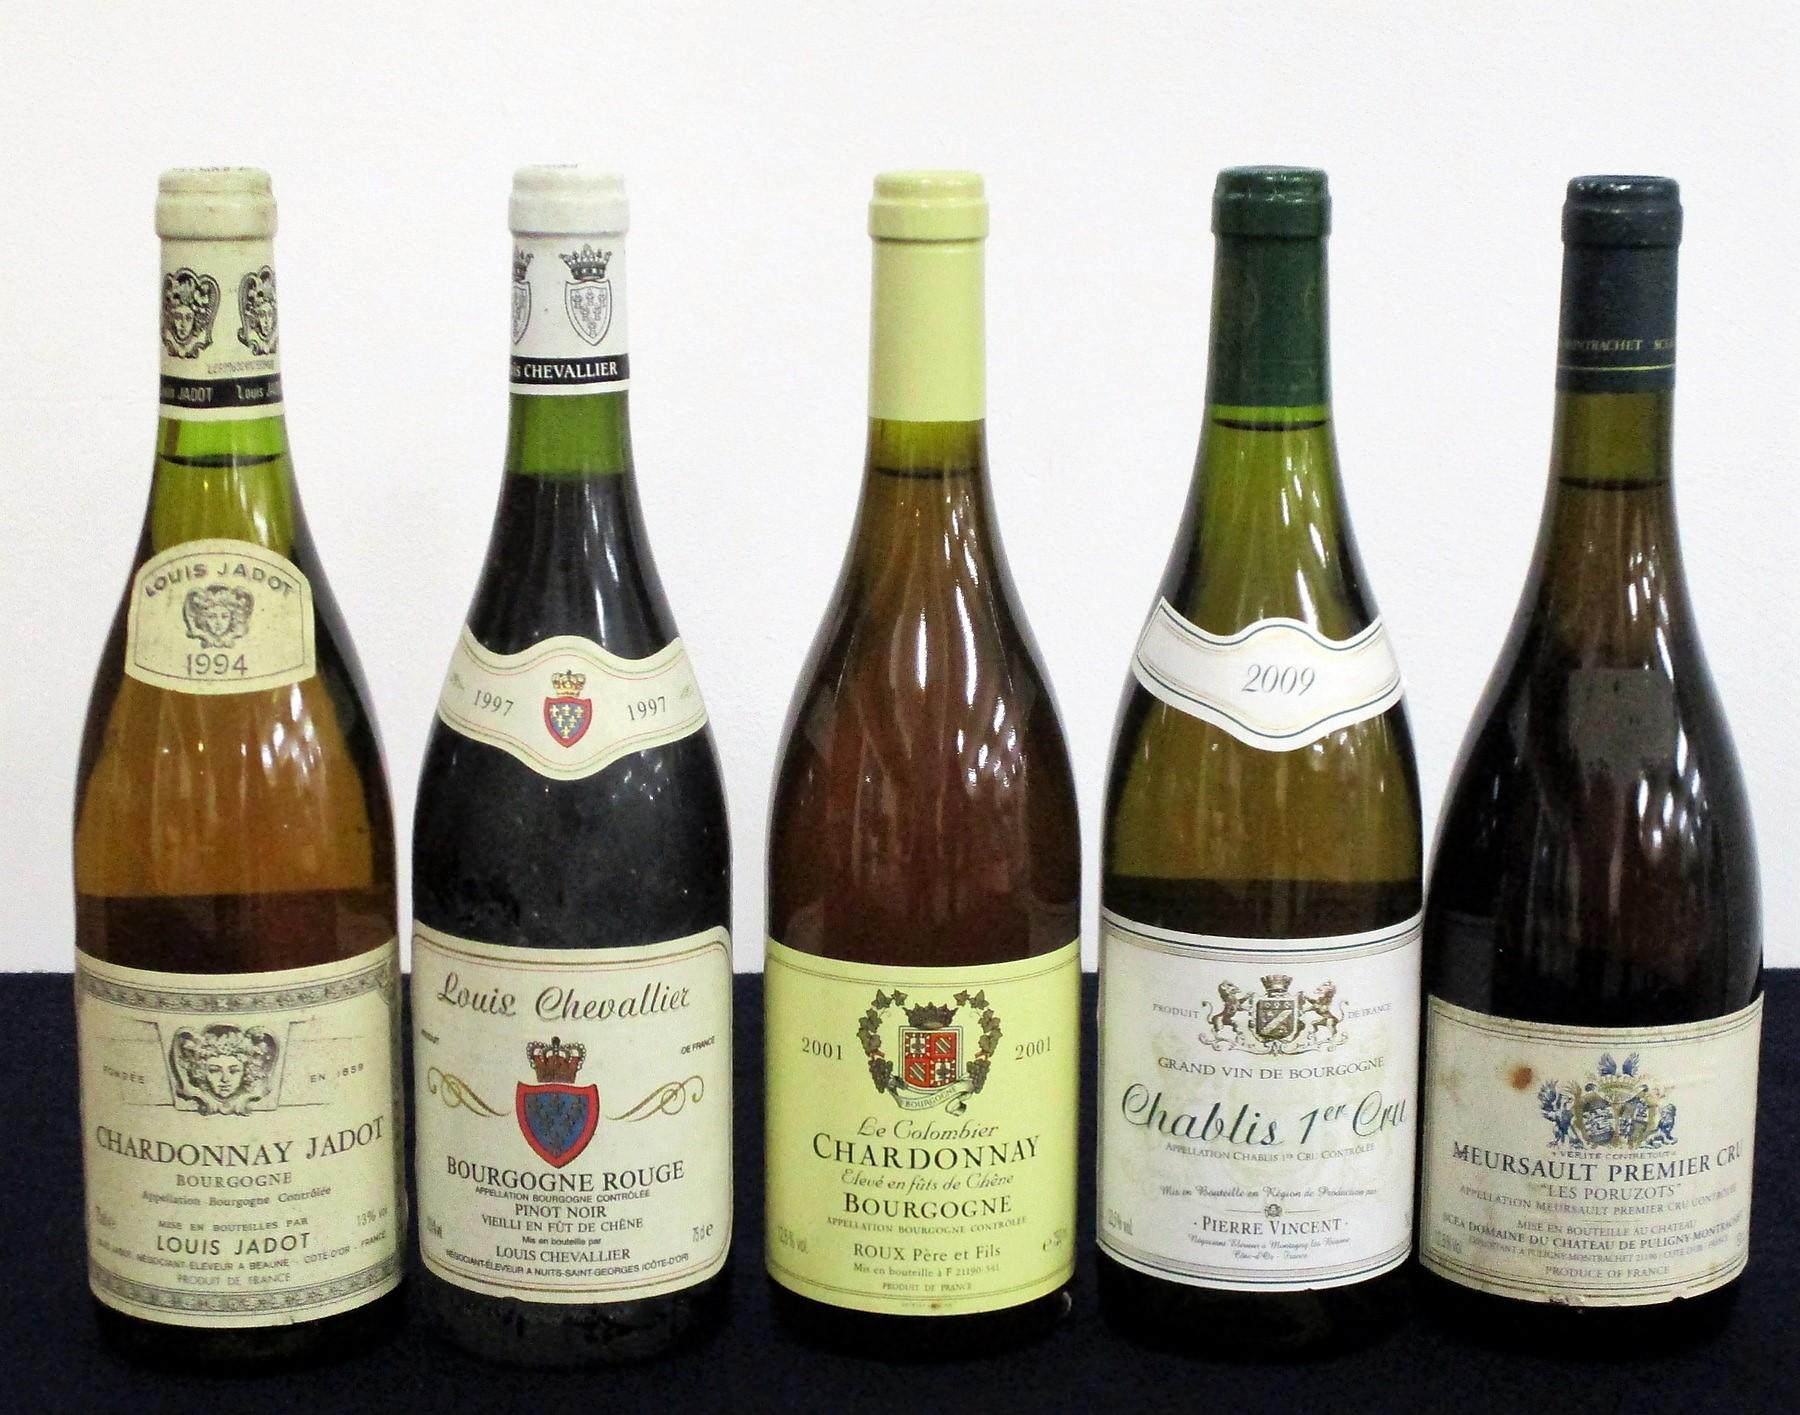 1 bt Chardonnay Jadot Bourgogne 1994 Louis Jadot i.n, sl bs 1 bt Louis Chevalier Bourgogne Rouge